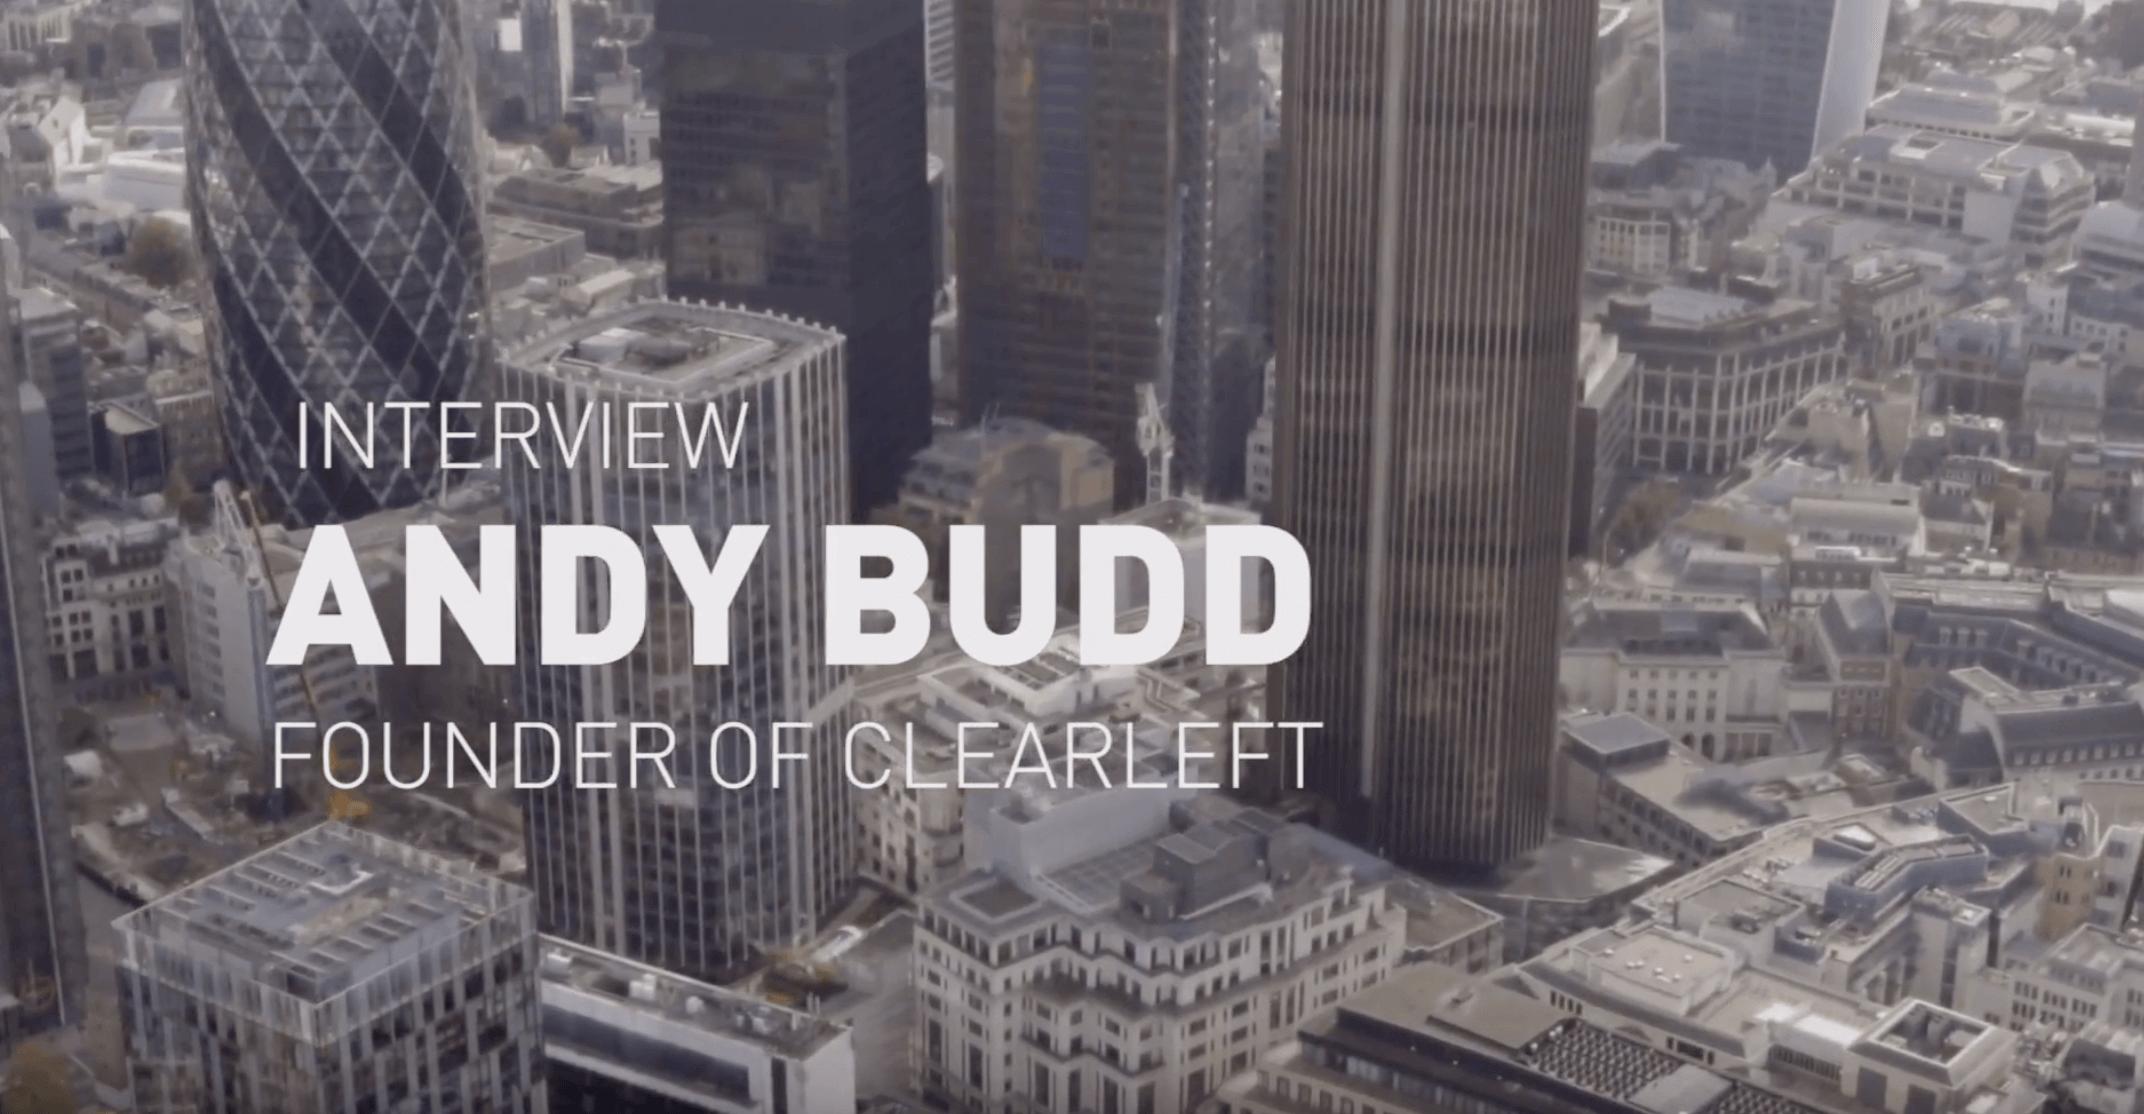 ANDY BUDD